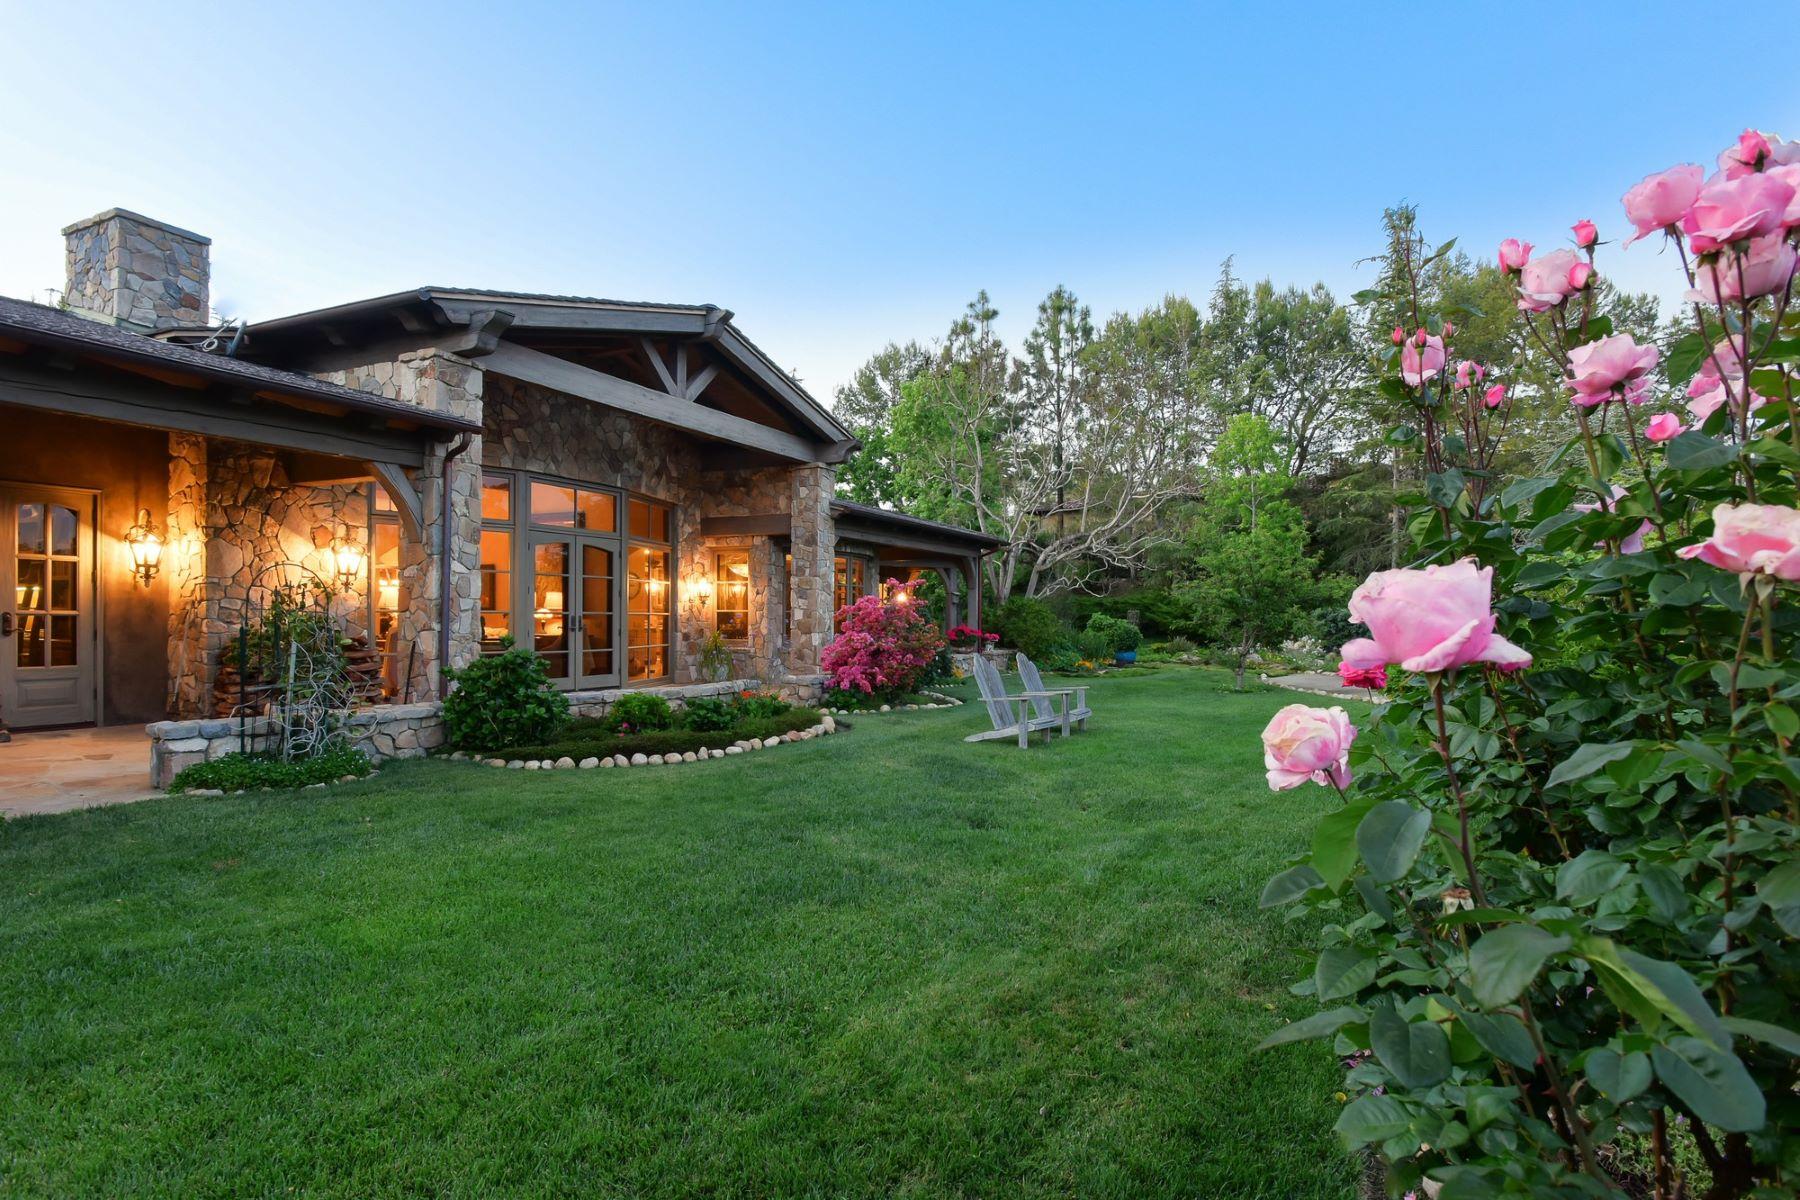 Single Family Homes for Sale at 17233 Via Recanto Rancho Santa Fe, California 92067 United States